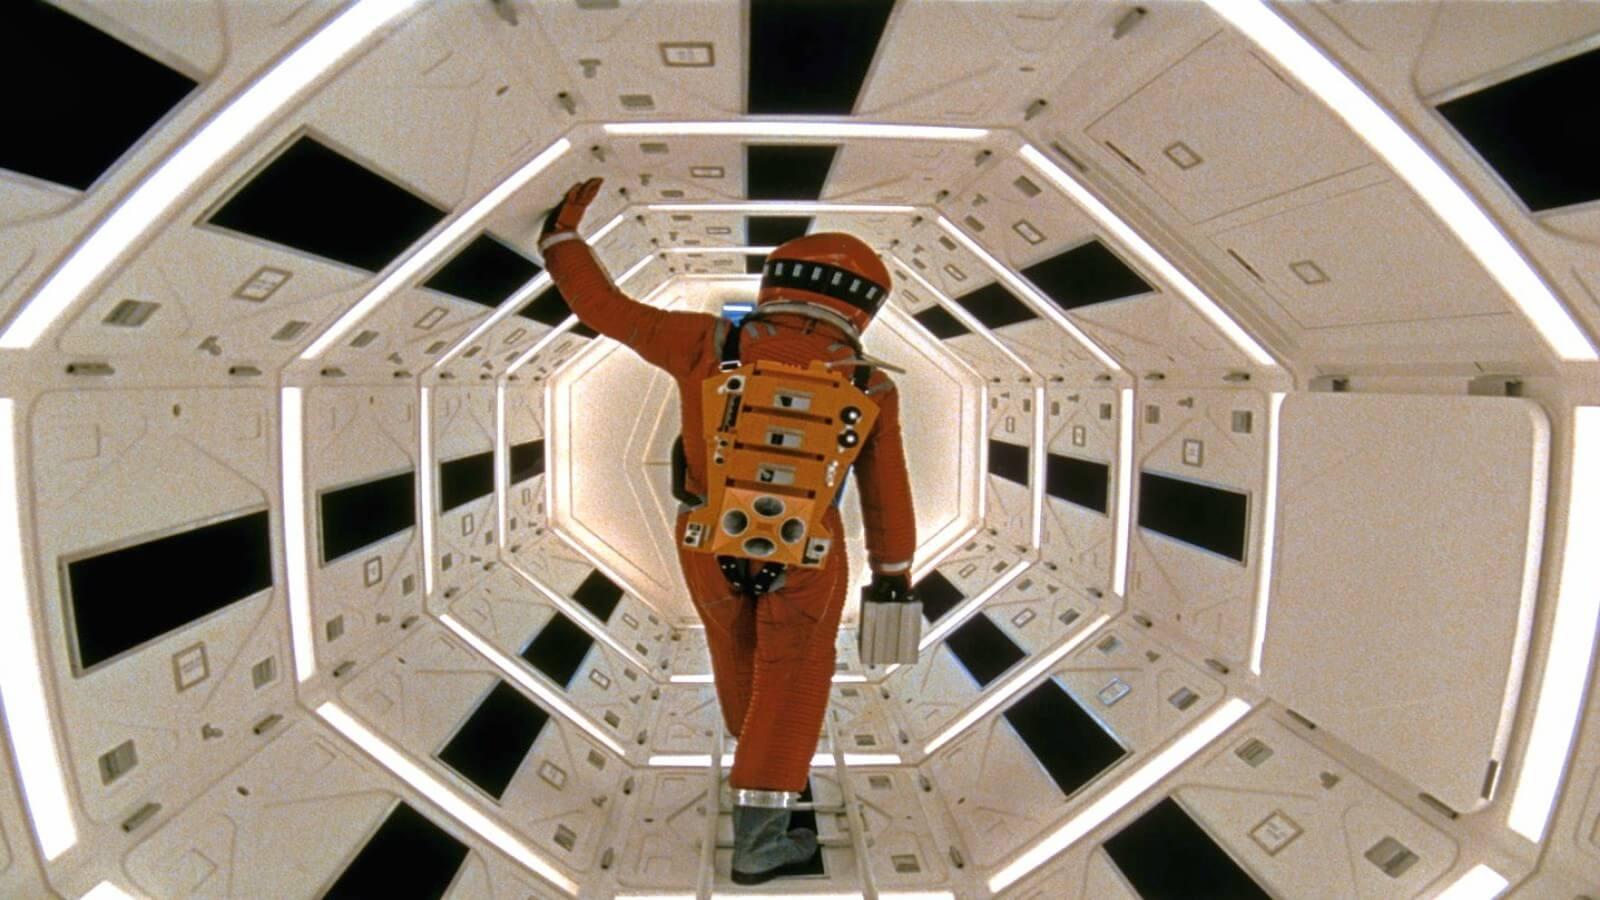 2001-a-space-odyssey-192625l-1.jpg